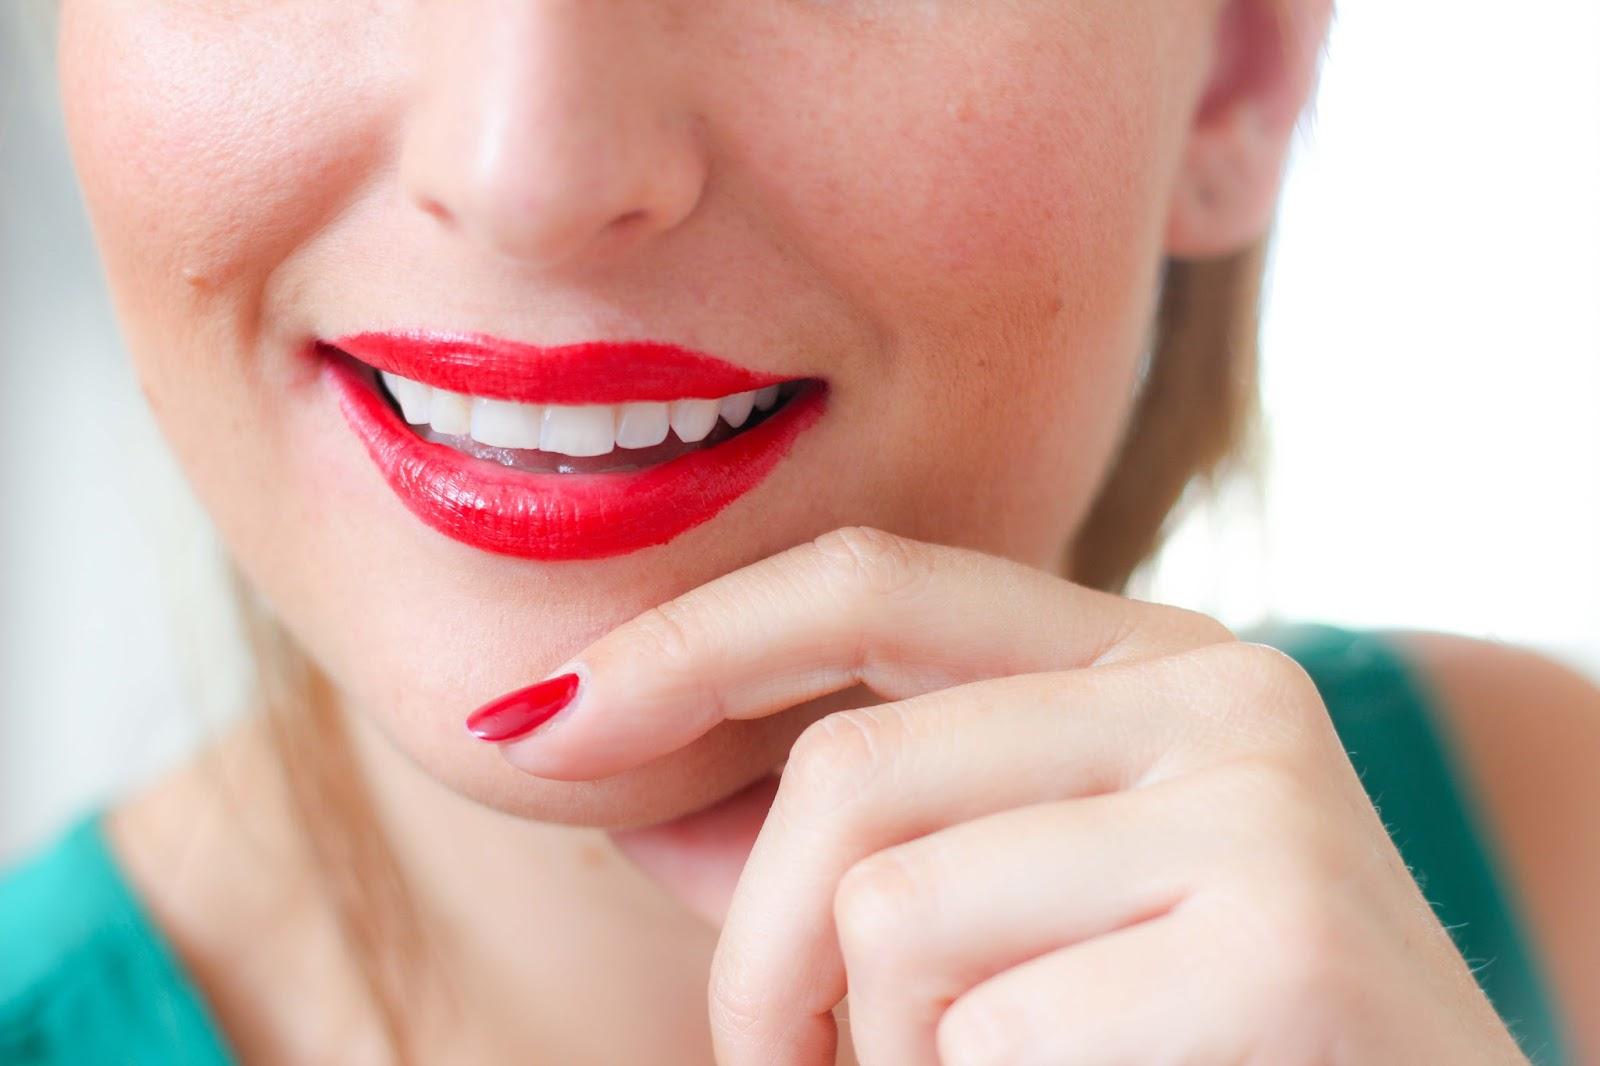 Sexy Balm-Sexy Balm Testbericht- Lippenstifttest - Lippenstift Bericht - beauty Blog - Fashionstylebyjohanna